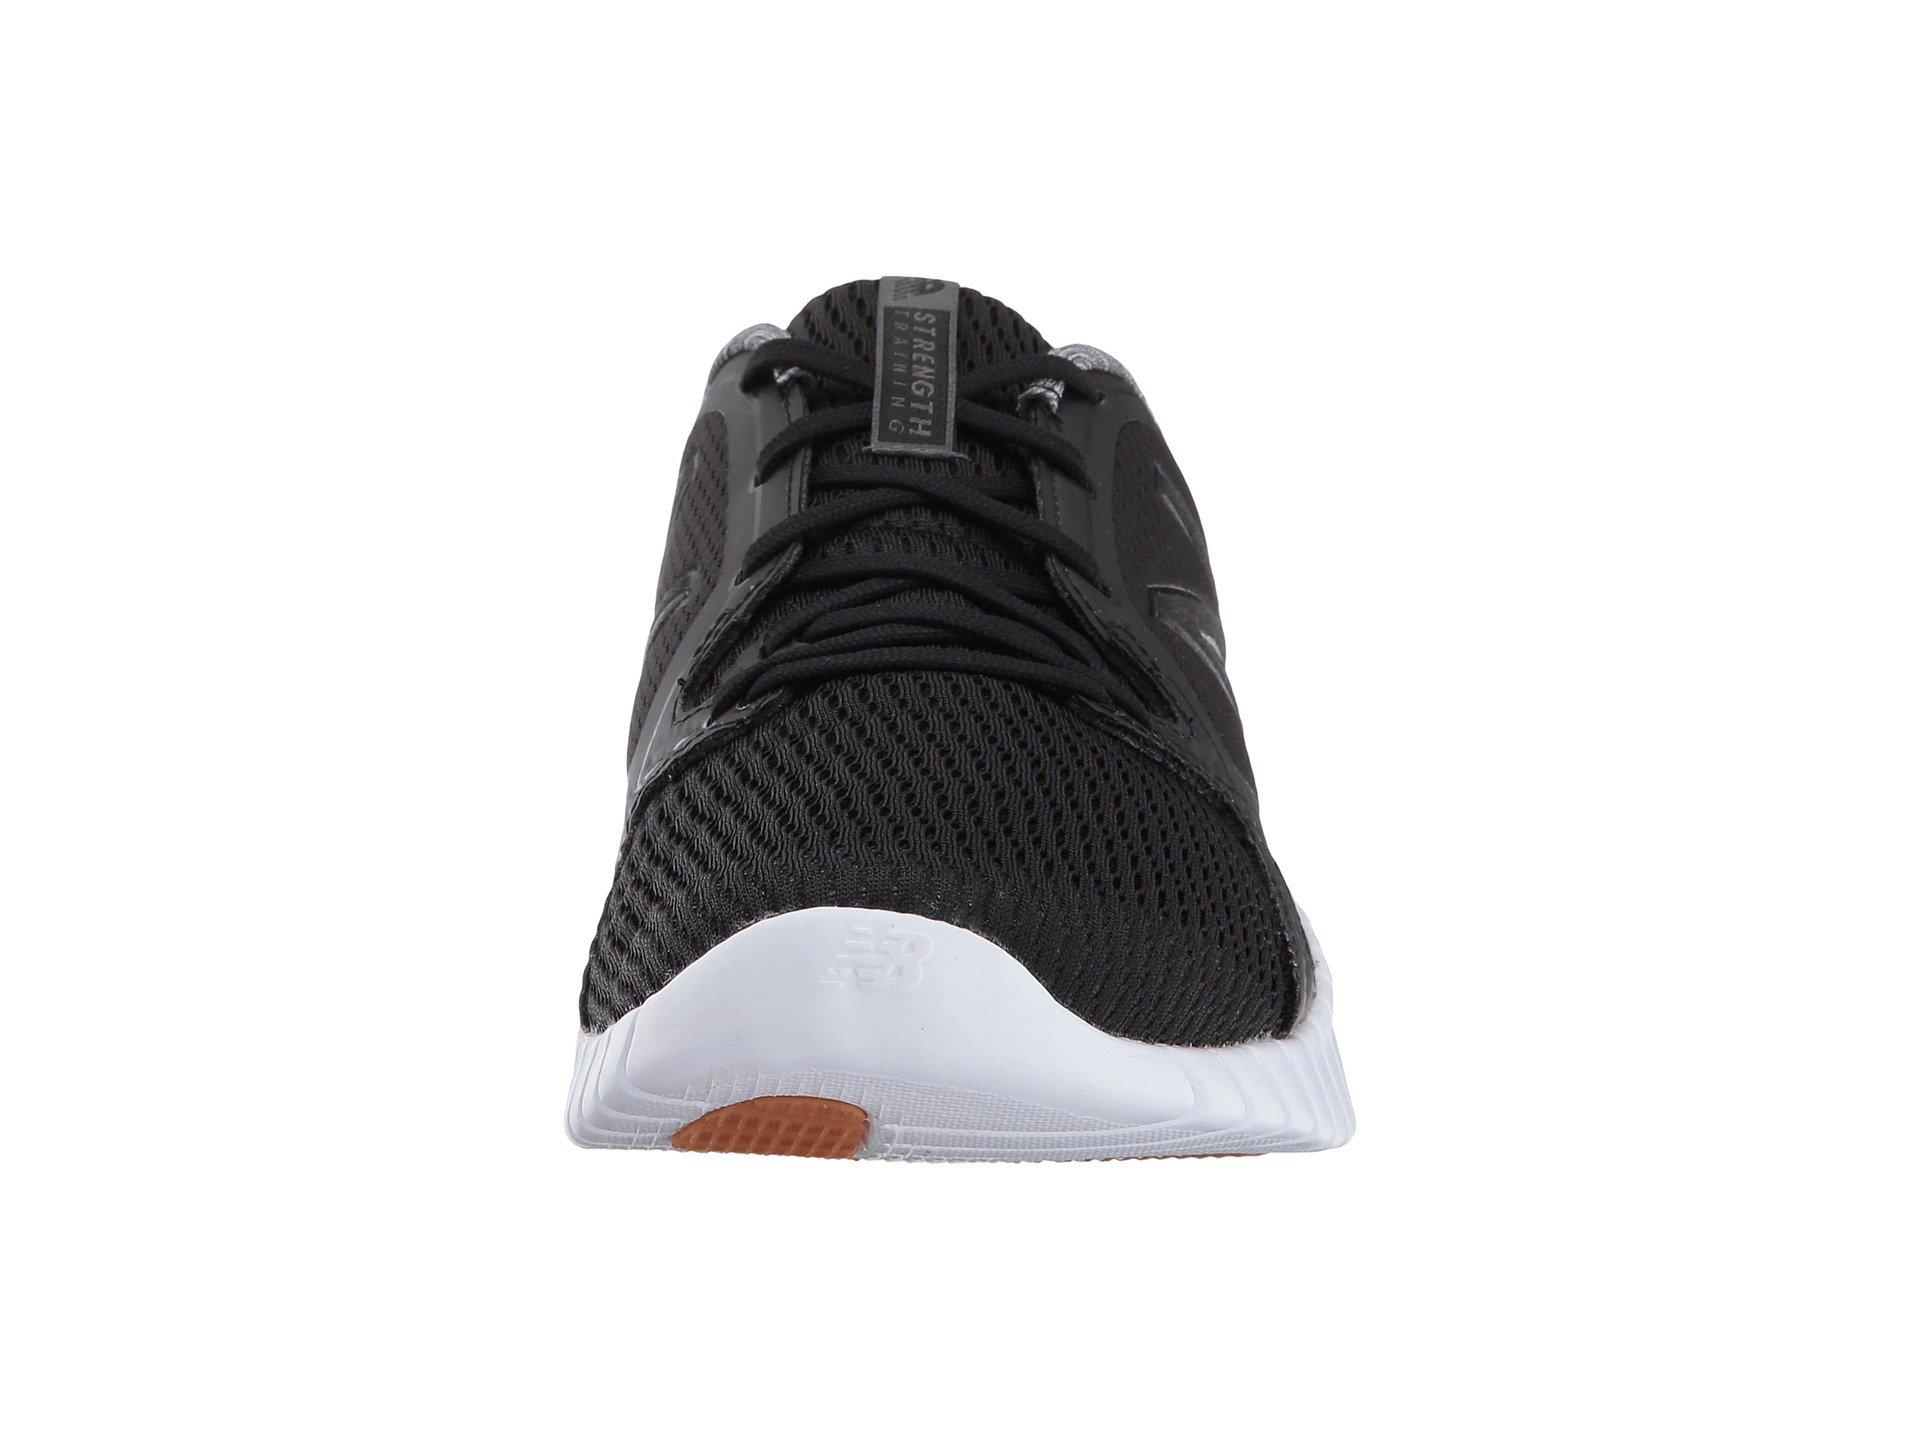 New Balance Flexonic Shoes Fantom Fit